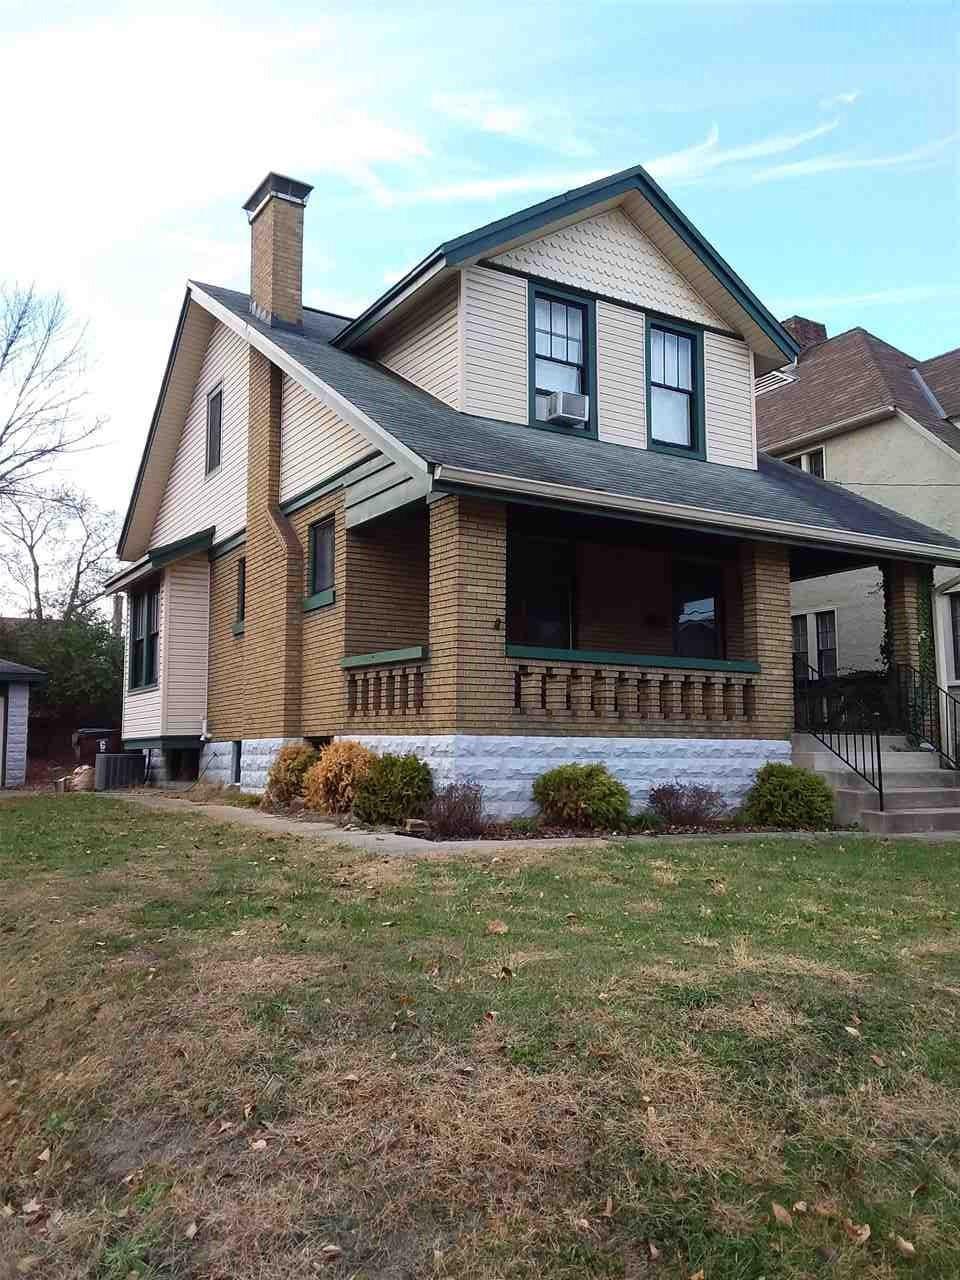 Photo 2 for 2111 Glenway Ave Covington, KY 41014